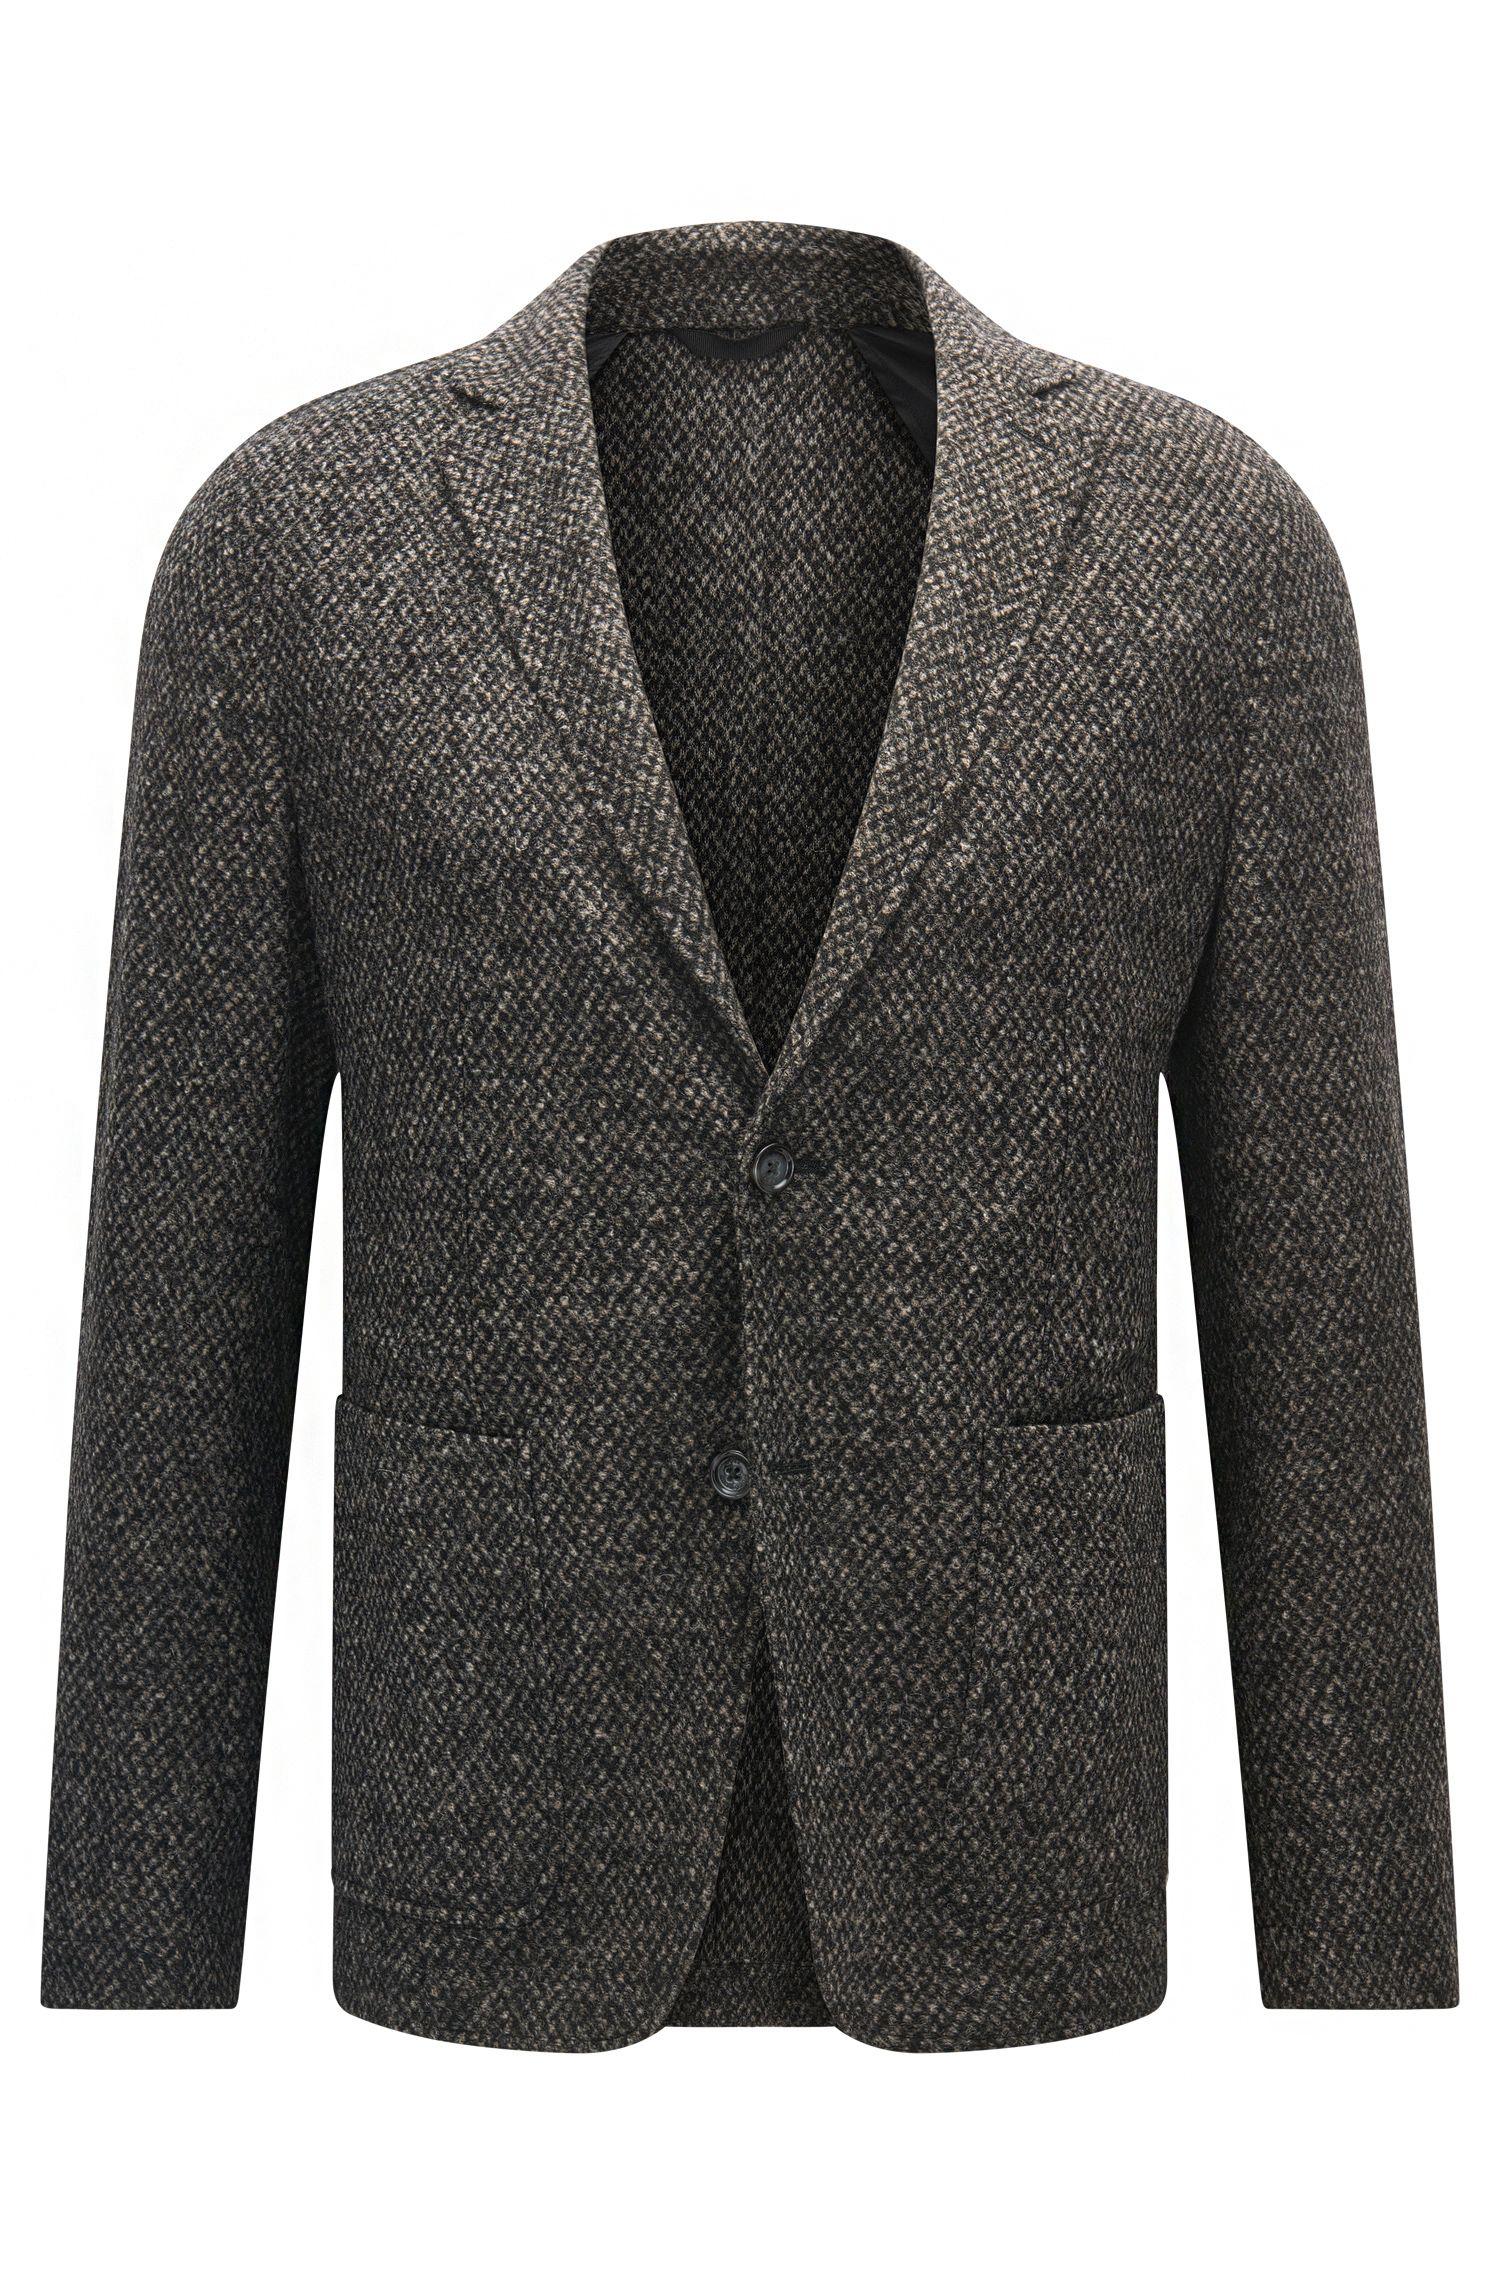 'T-Neldon' | Slim Fit, Tweed Sport Coat